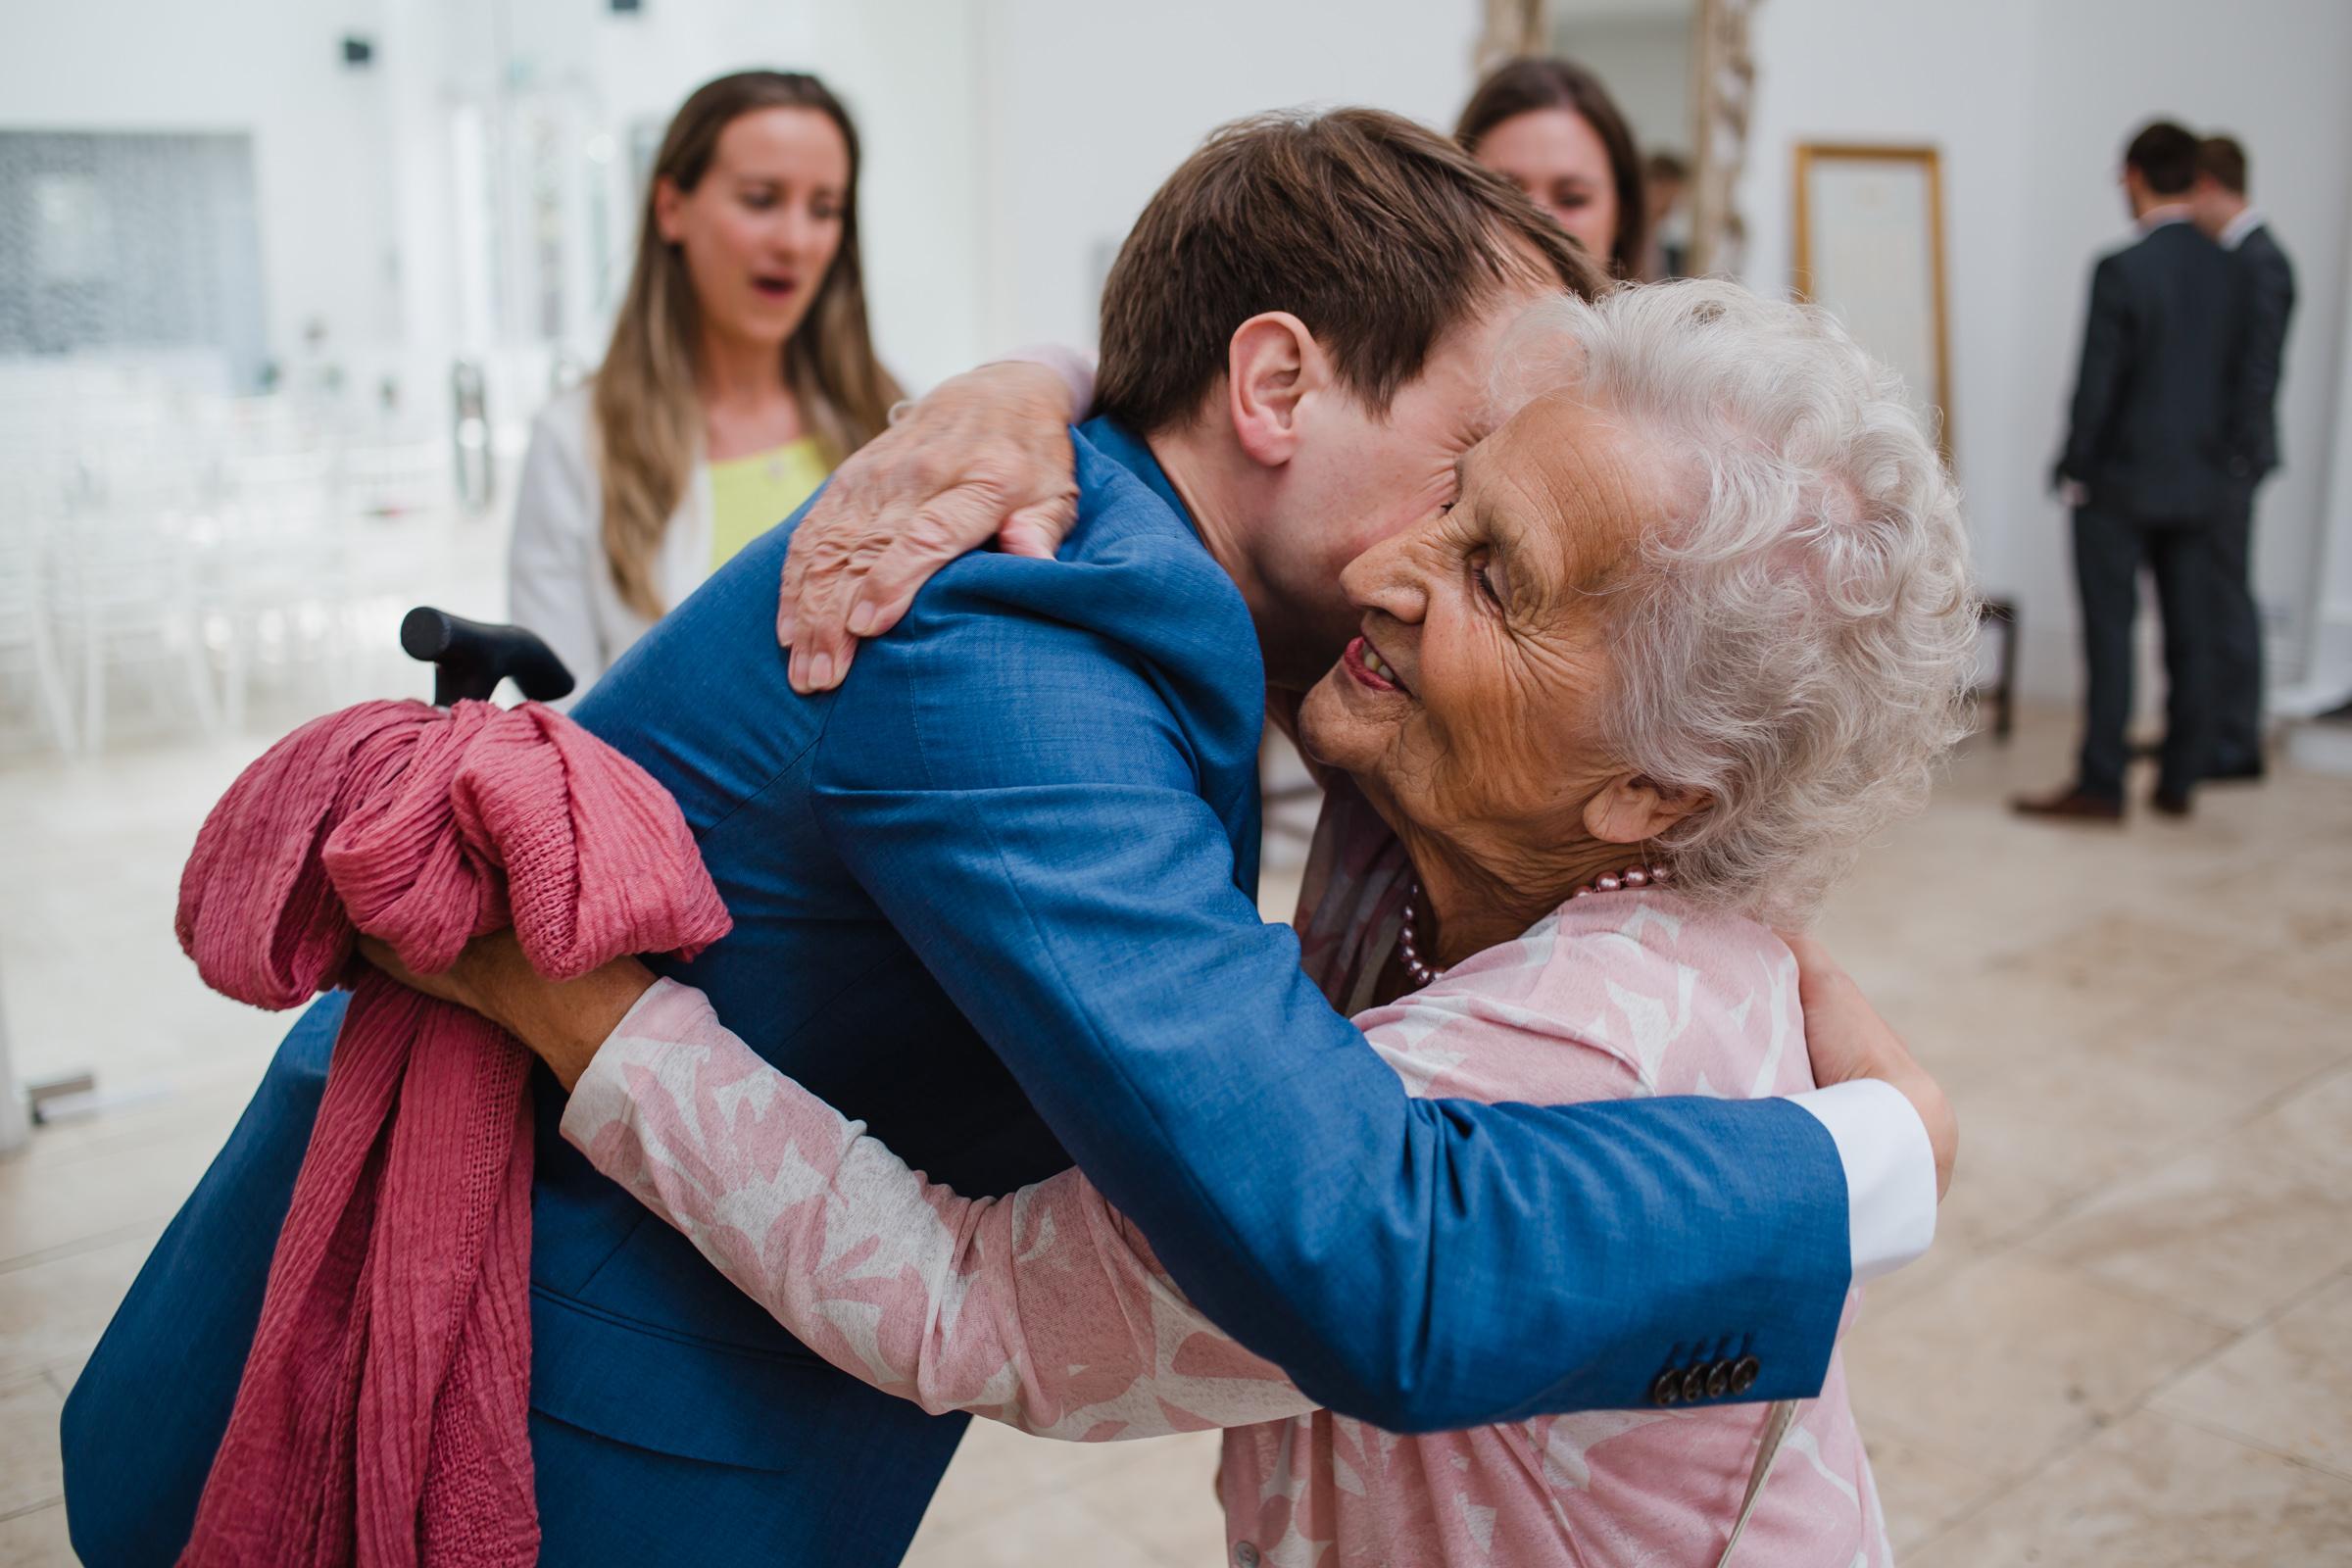 grandma gets a hug from the groom at a wedding at fazeley studios.